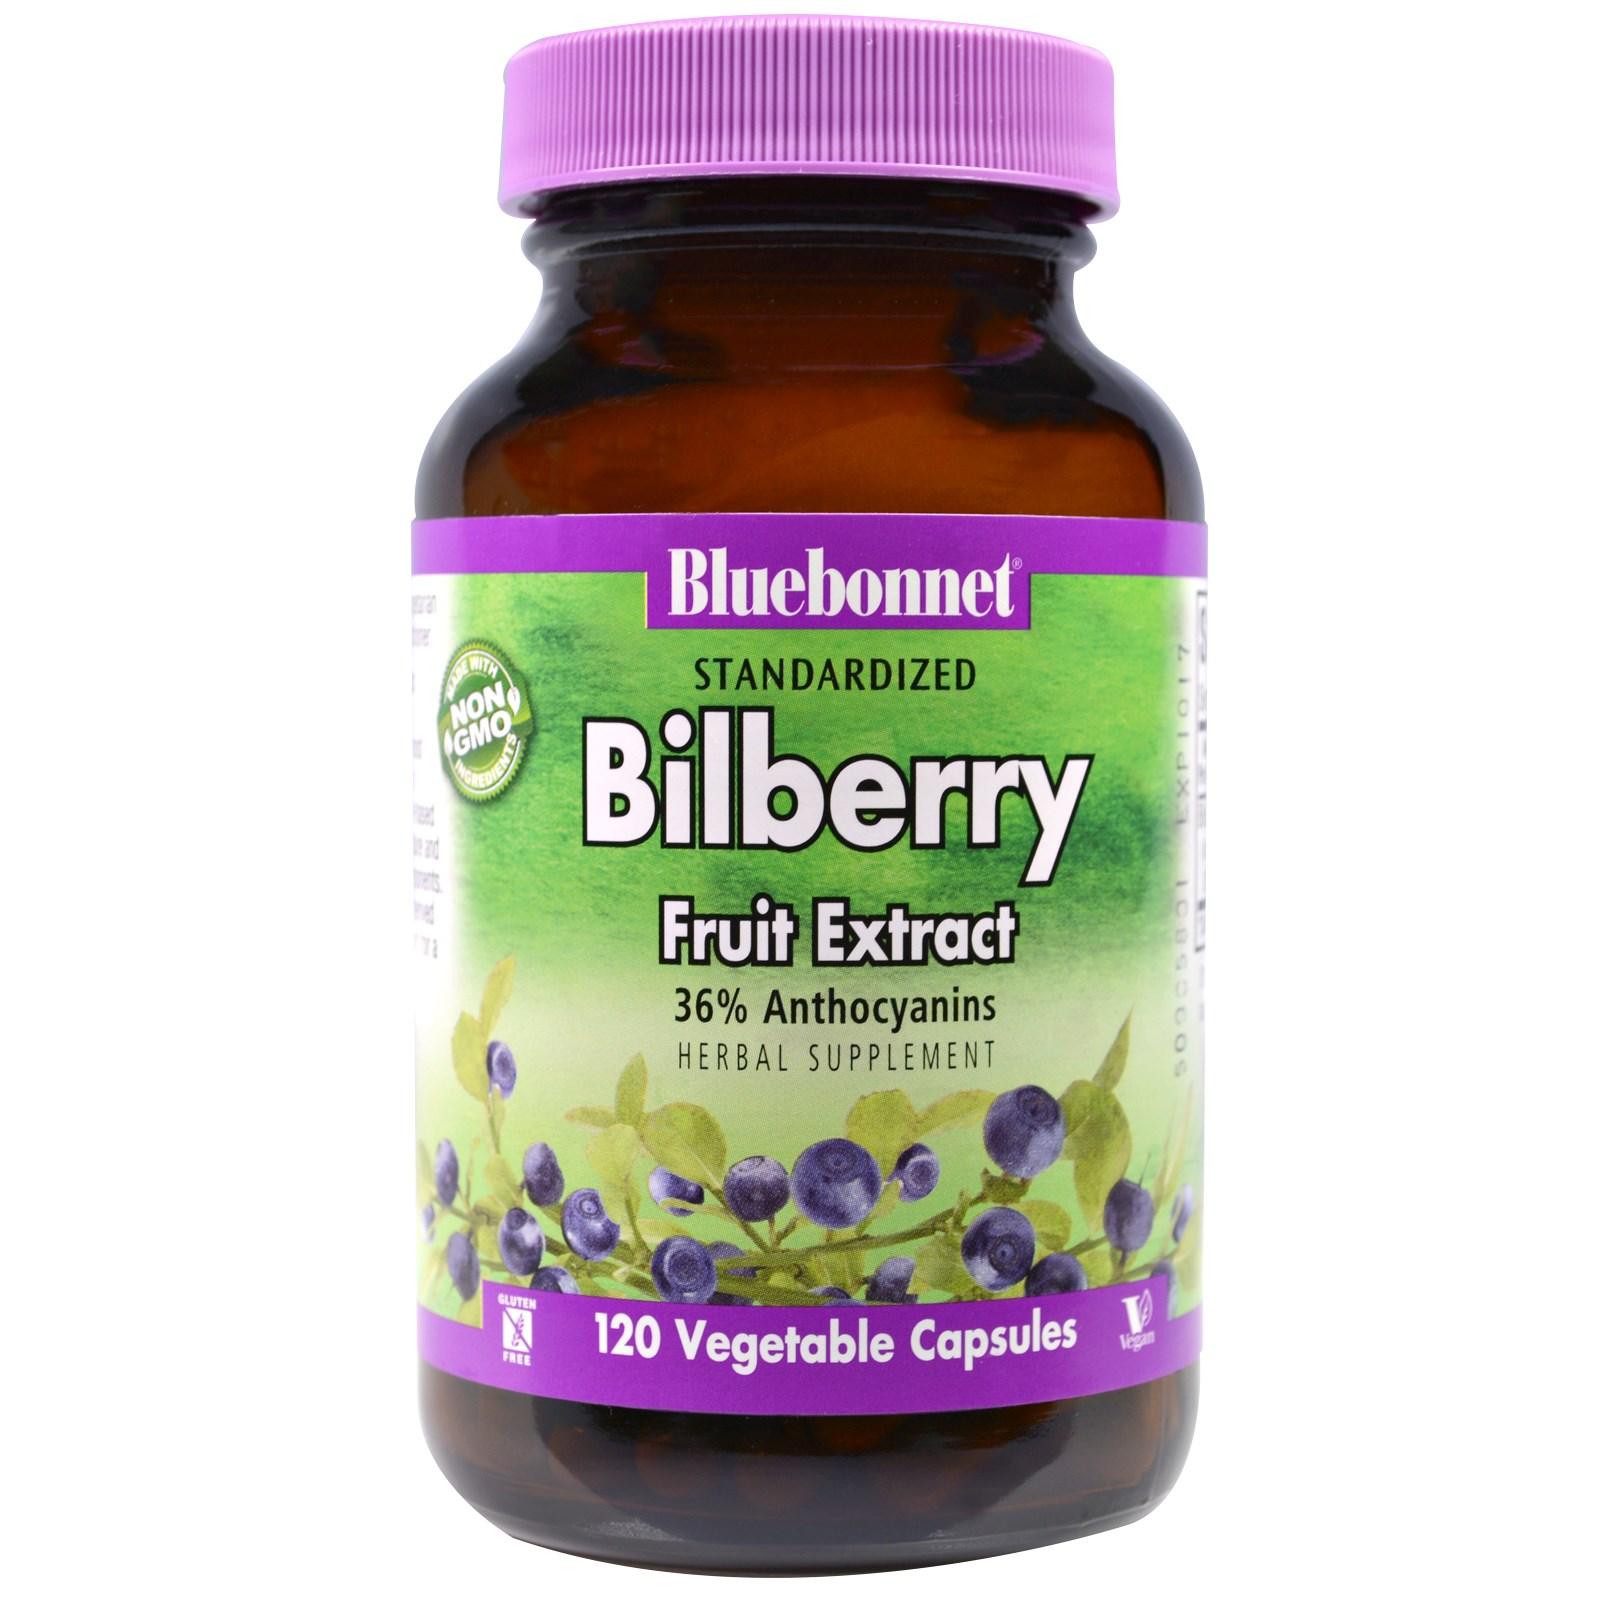 bluebonnet nutrition standardized bilberry fruit extract 120